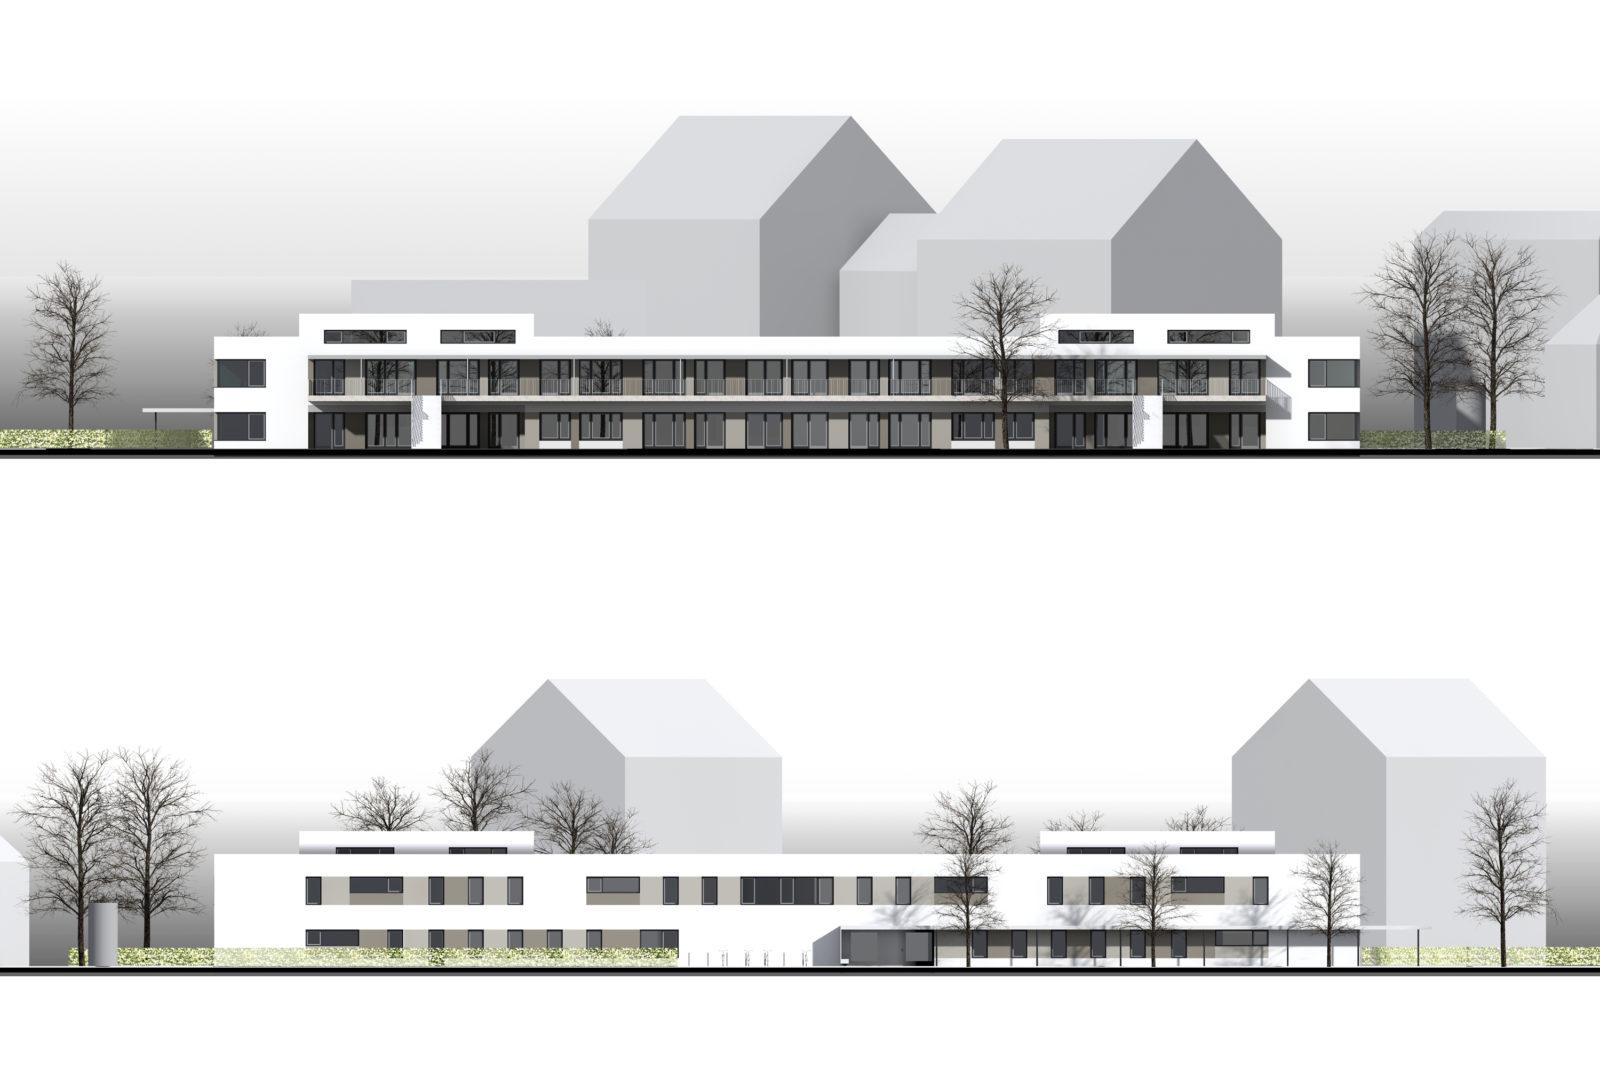 Neubau Kita Ludolf-Colditz-Straße in Leipzig, Stötteritz - Ansichten